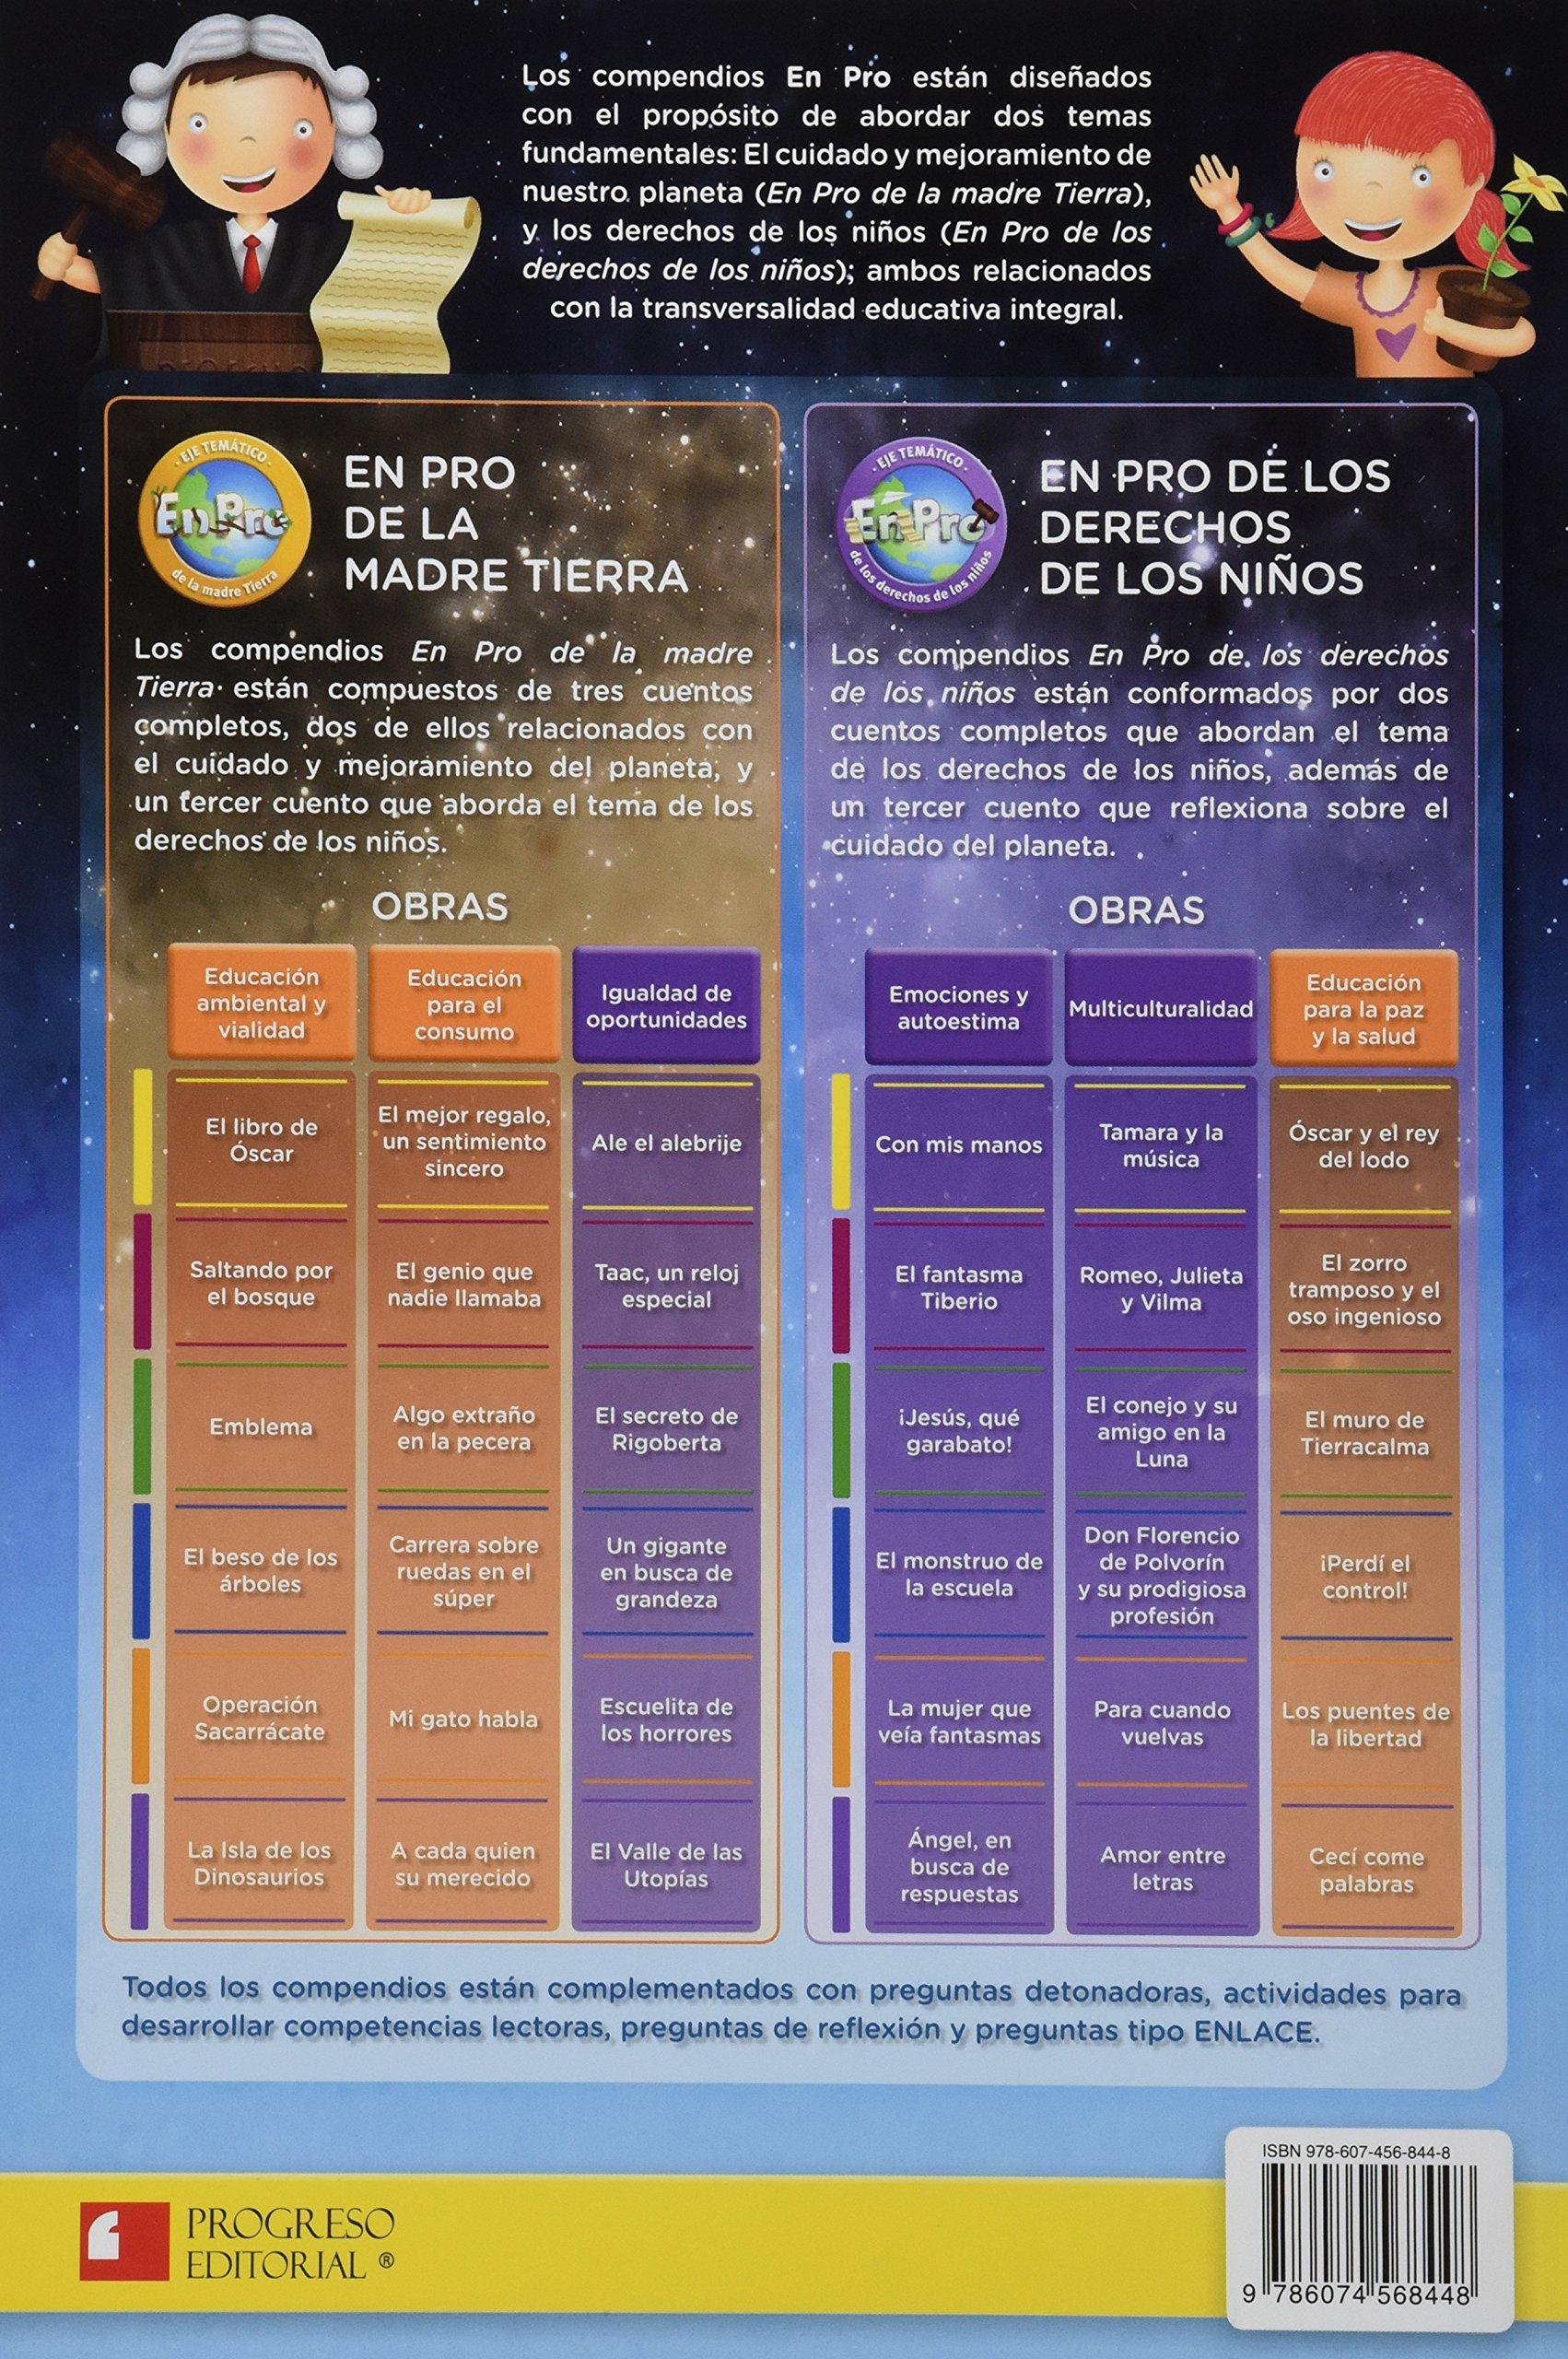 EN PRO DE LA MADRE TIERRA SERIE AMARILLA: JOSUE DANTE VELAZQUEZ: 9786074568448: Amazon.com: Books